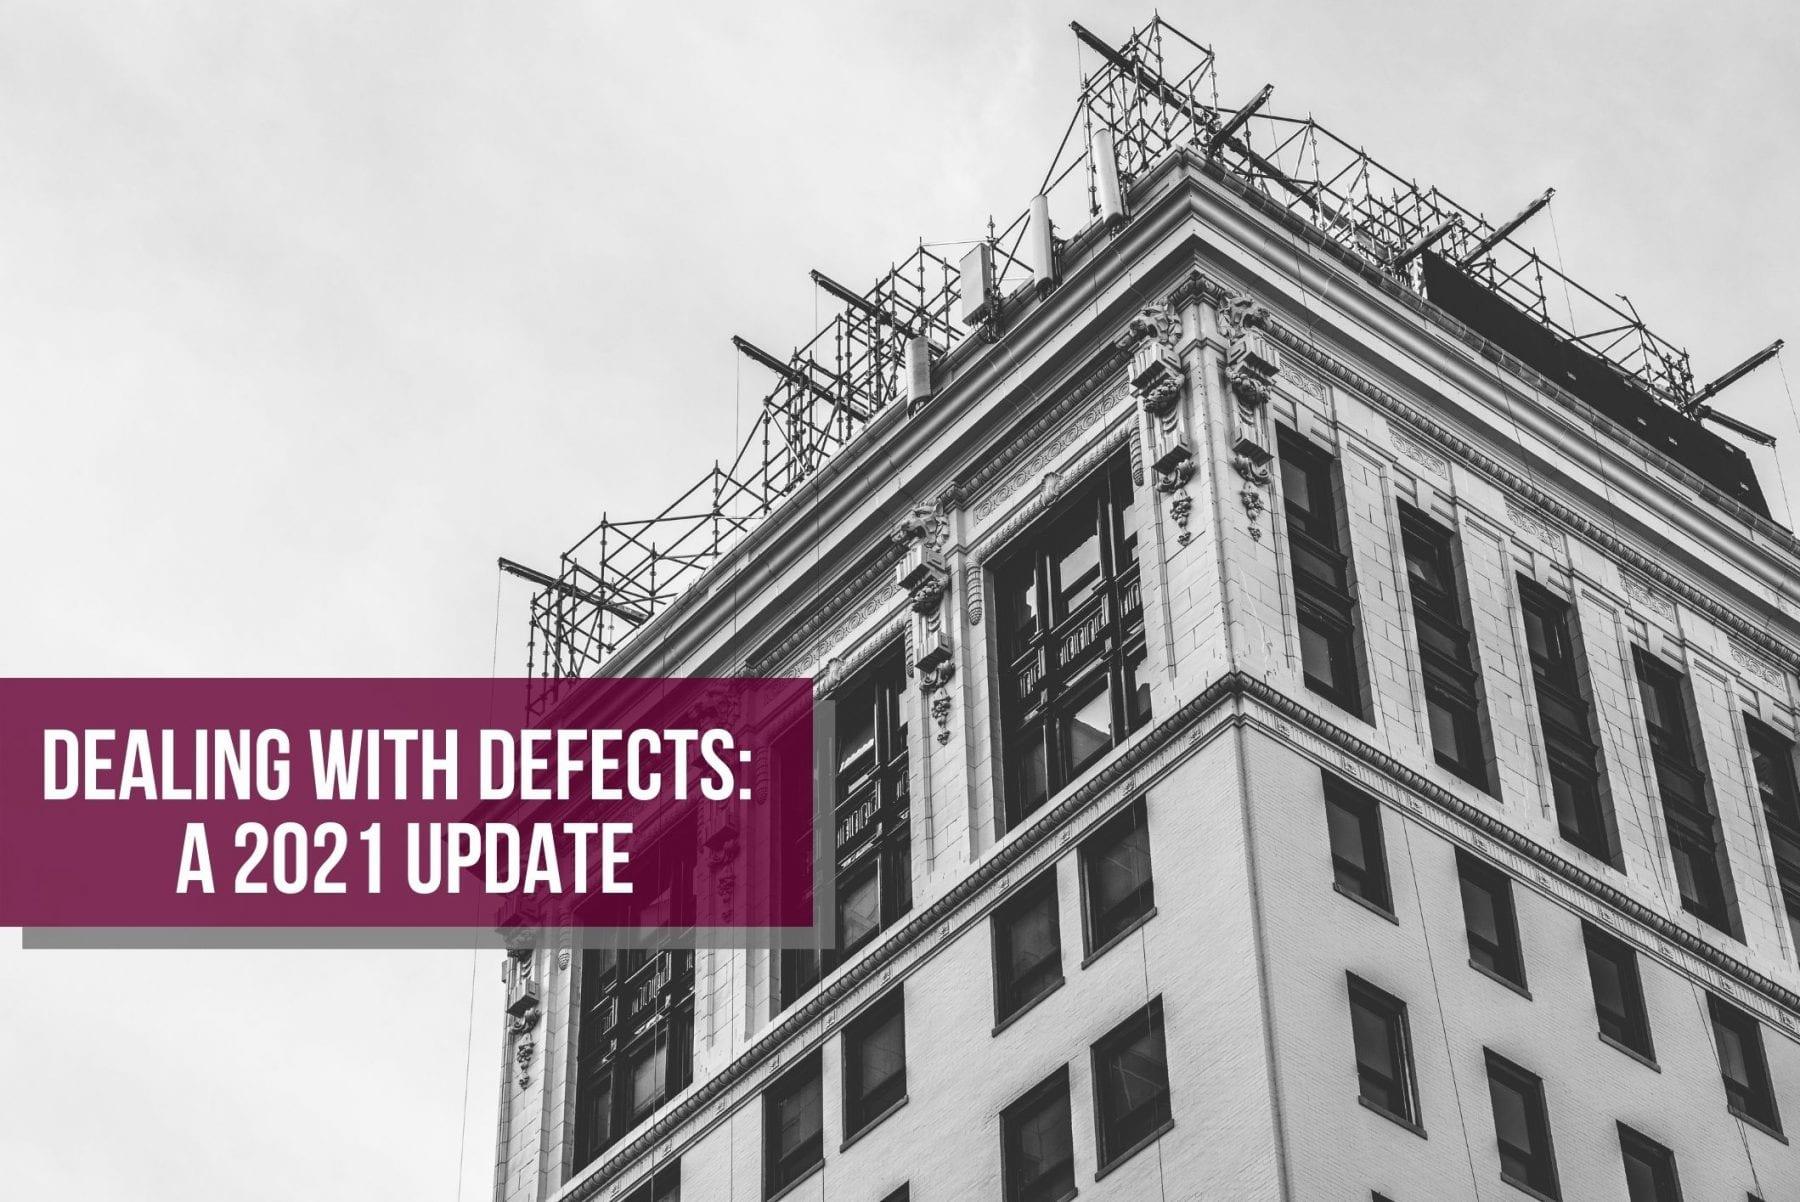 Strata building defect